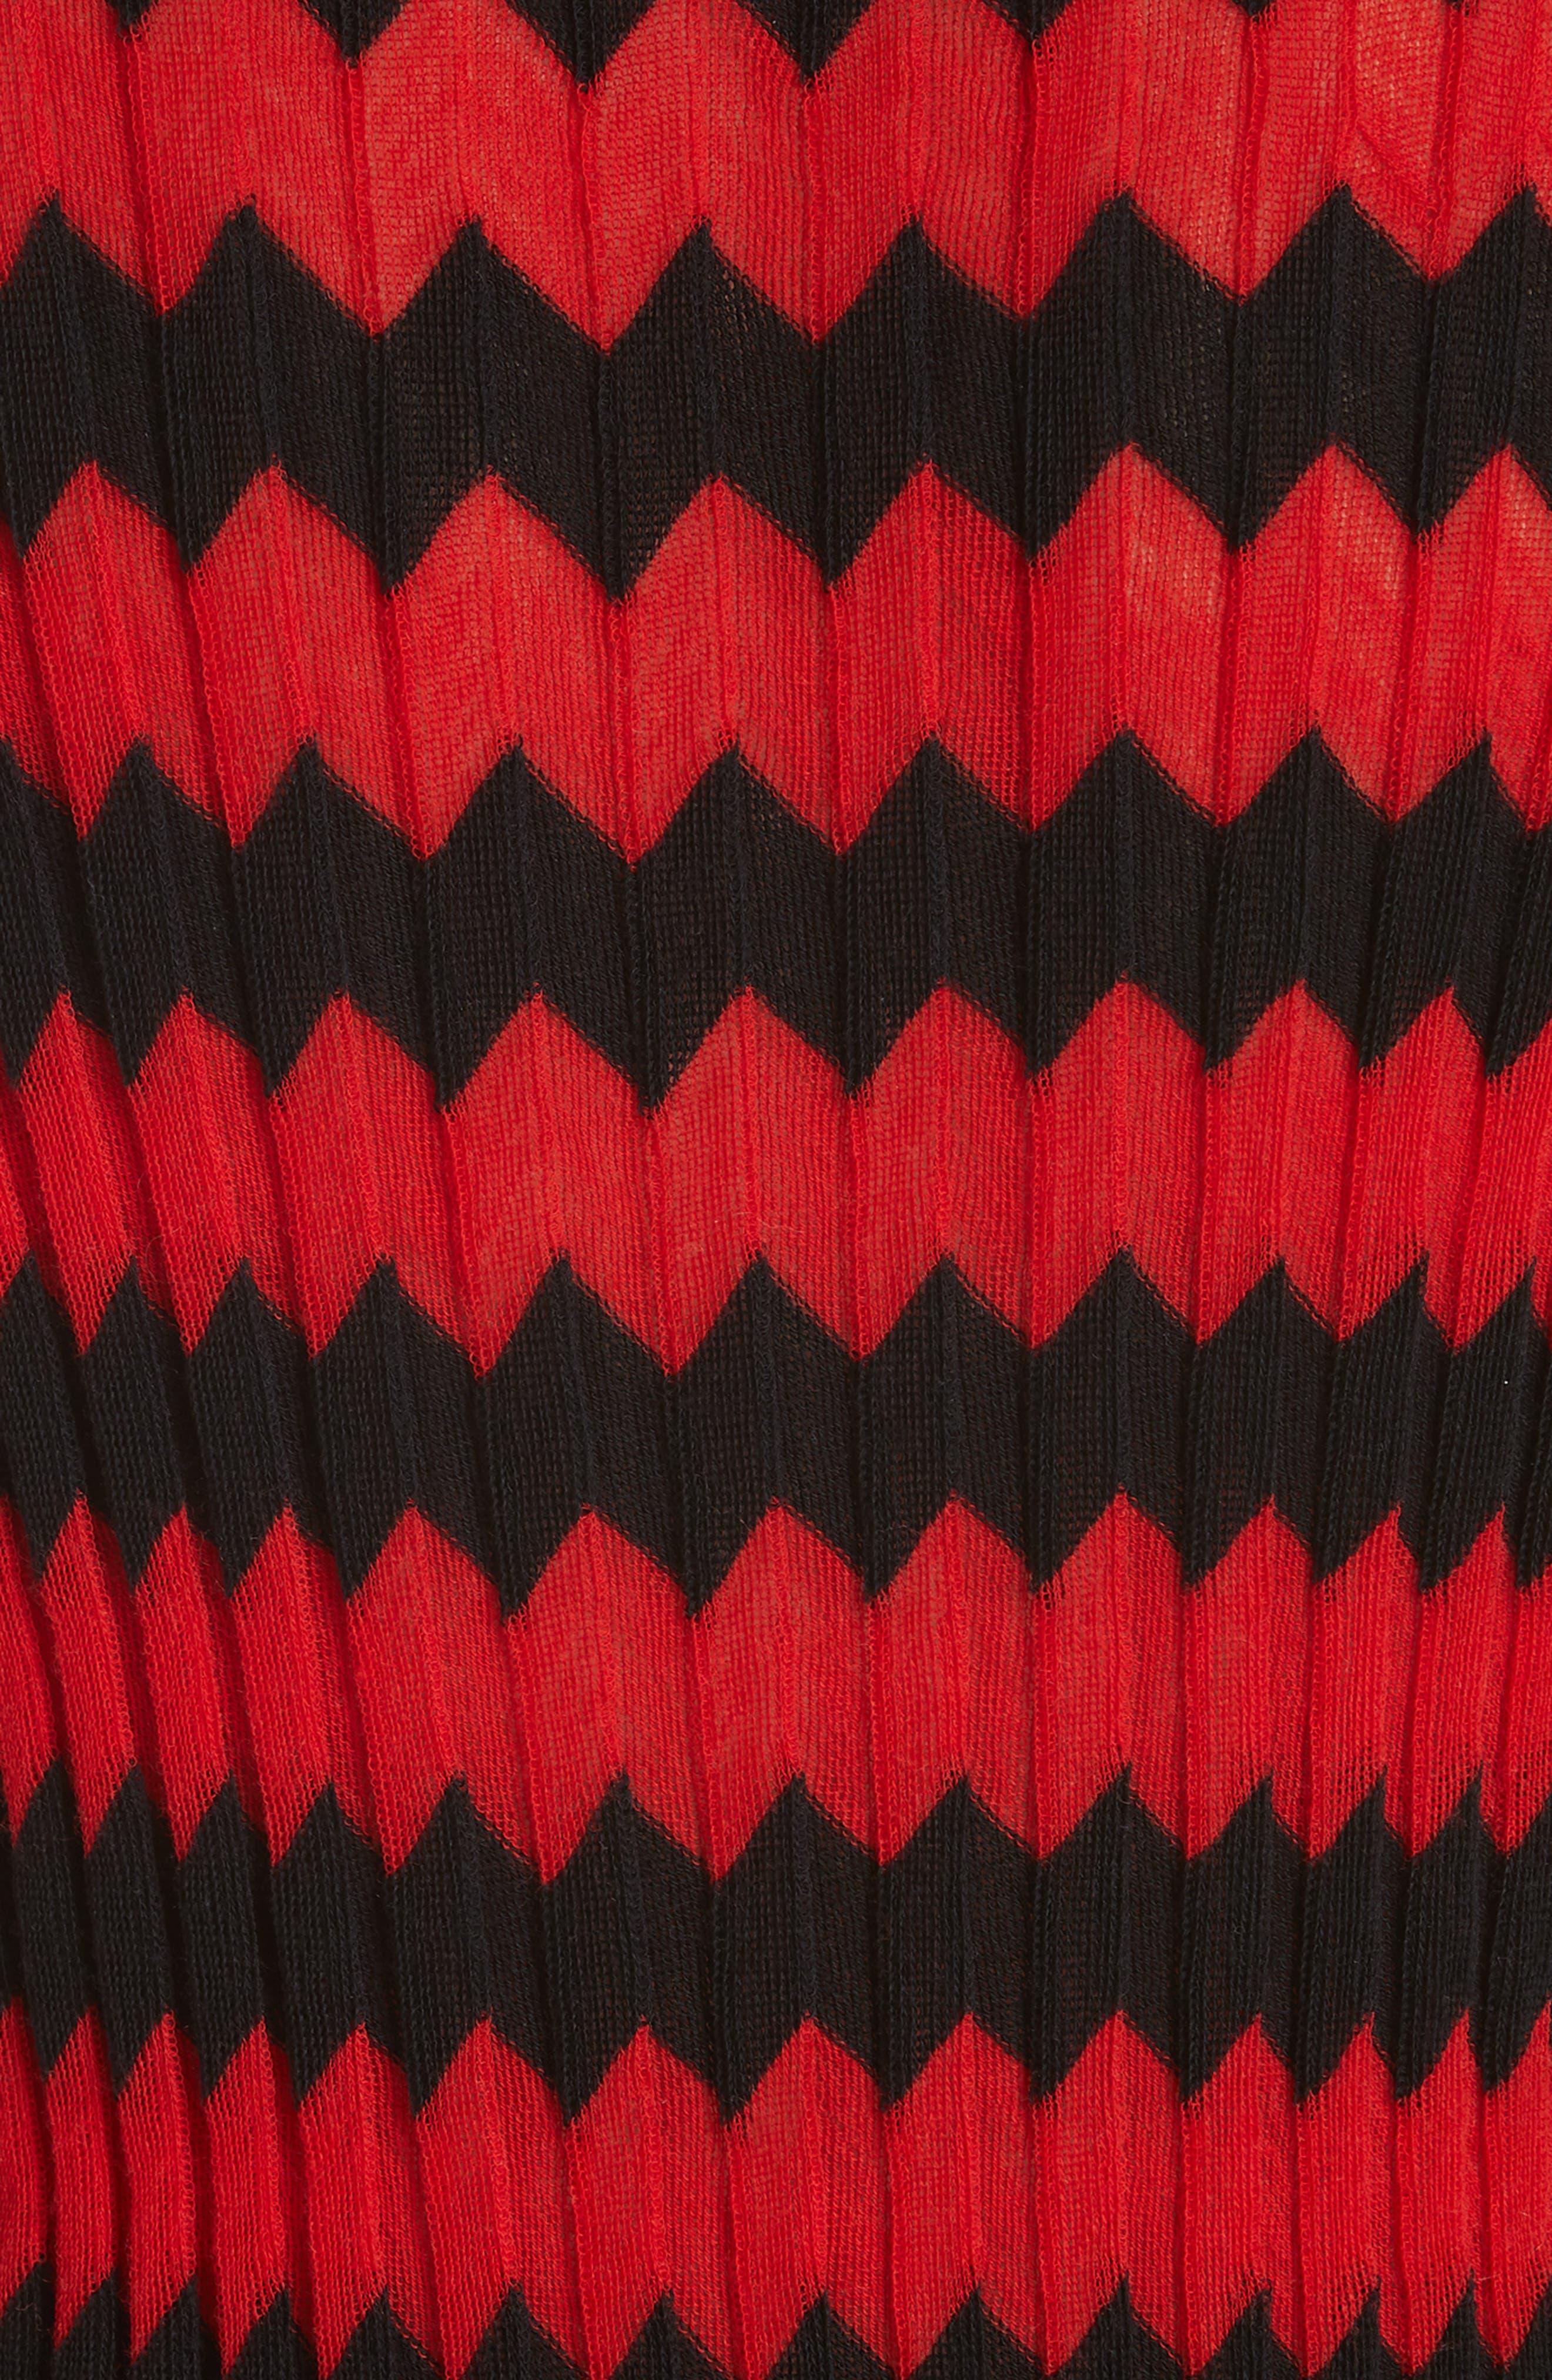 Chevron Stripe Wool Tank Top,                             Alternate thumbnail 5, color,                             RED BLACK